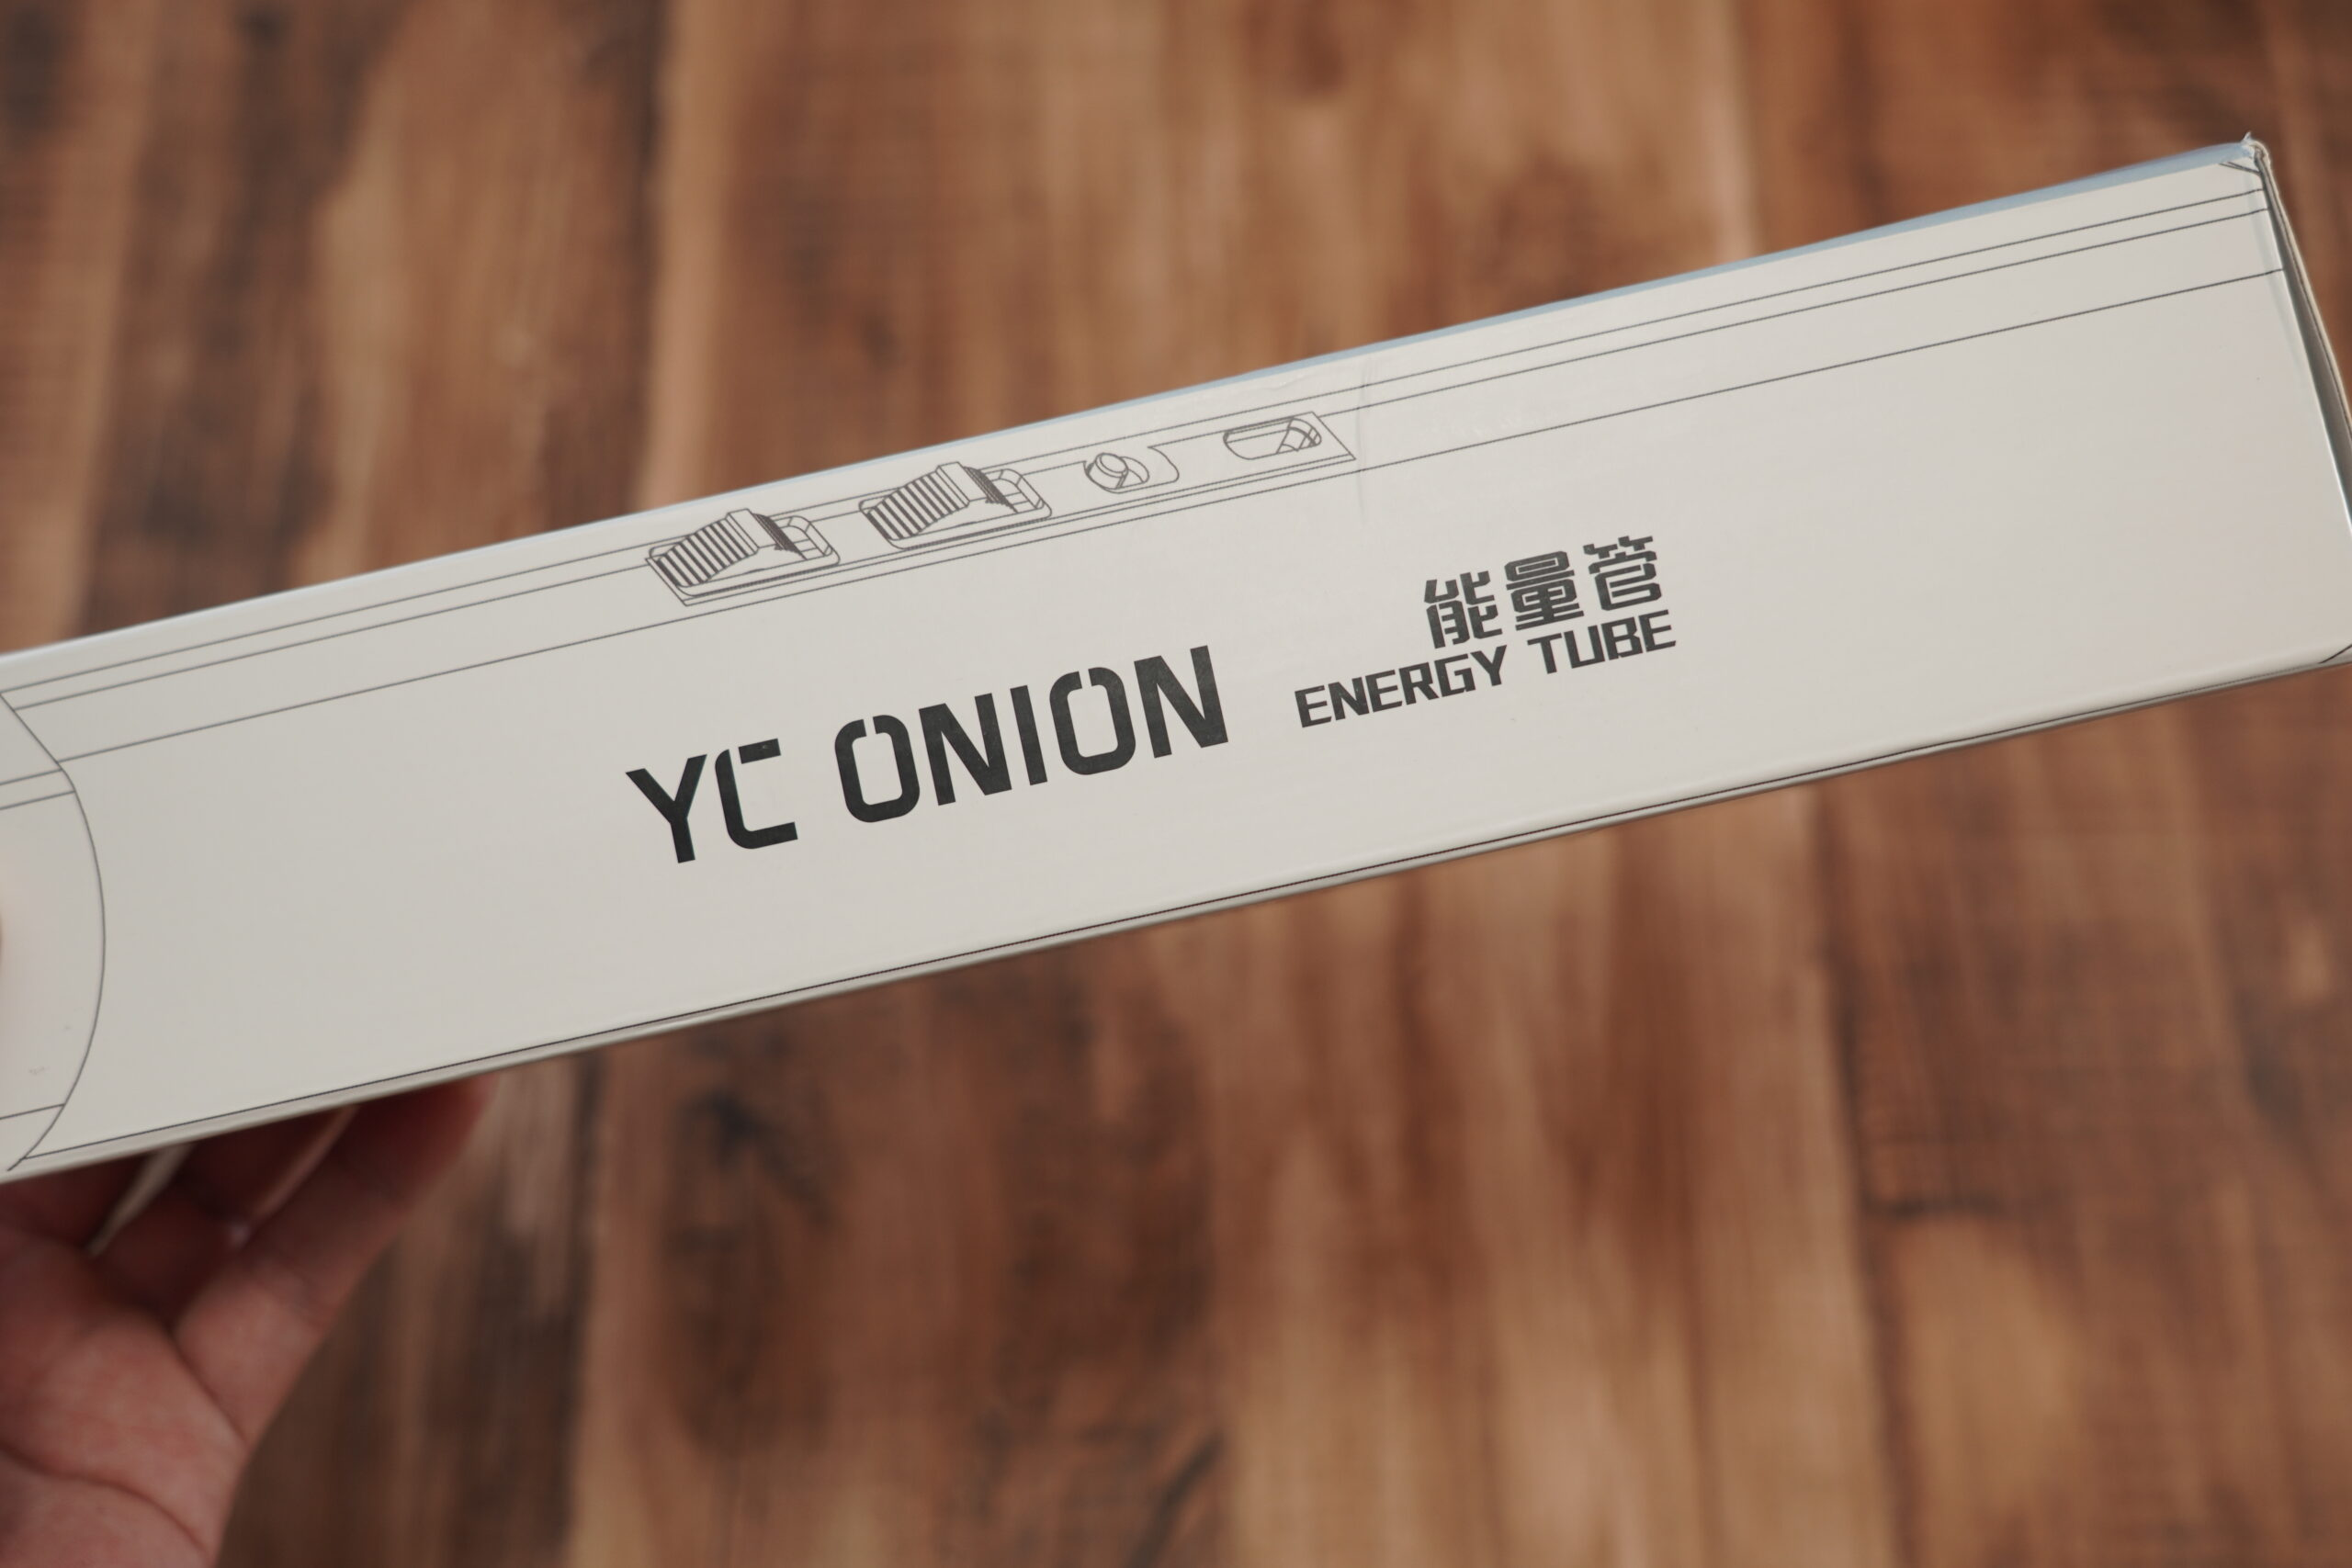 YC Onion Energy Tube